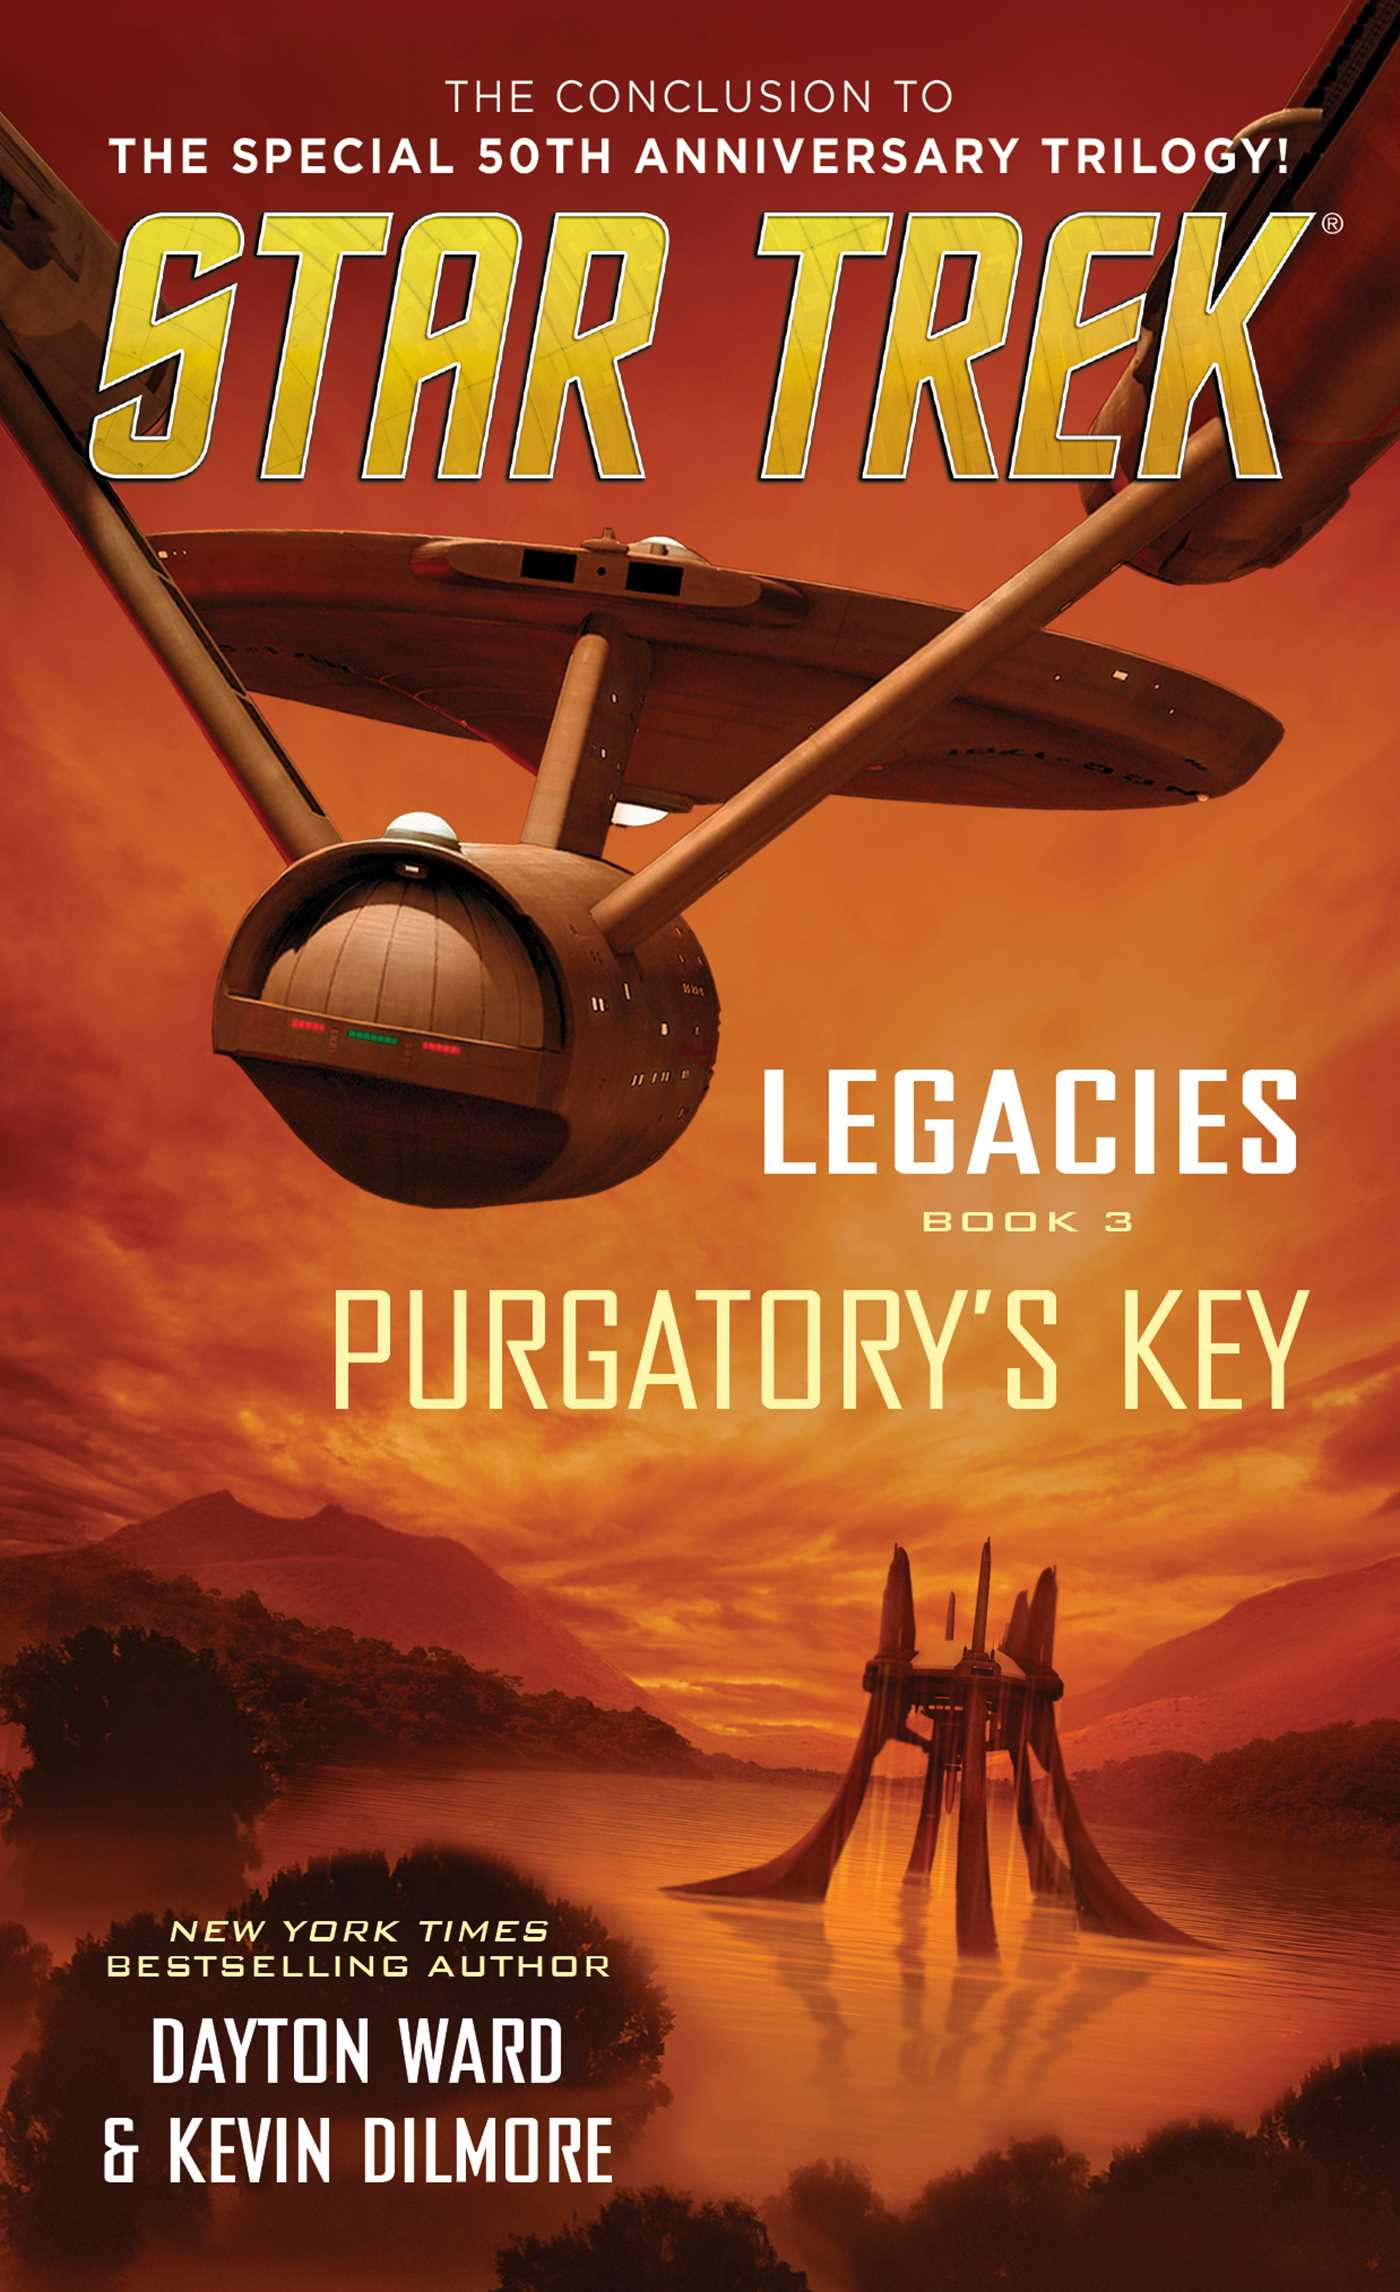 Legacies book 3 purgatorys key 9781501122781 hr